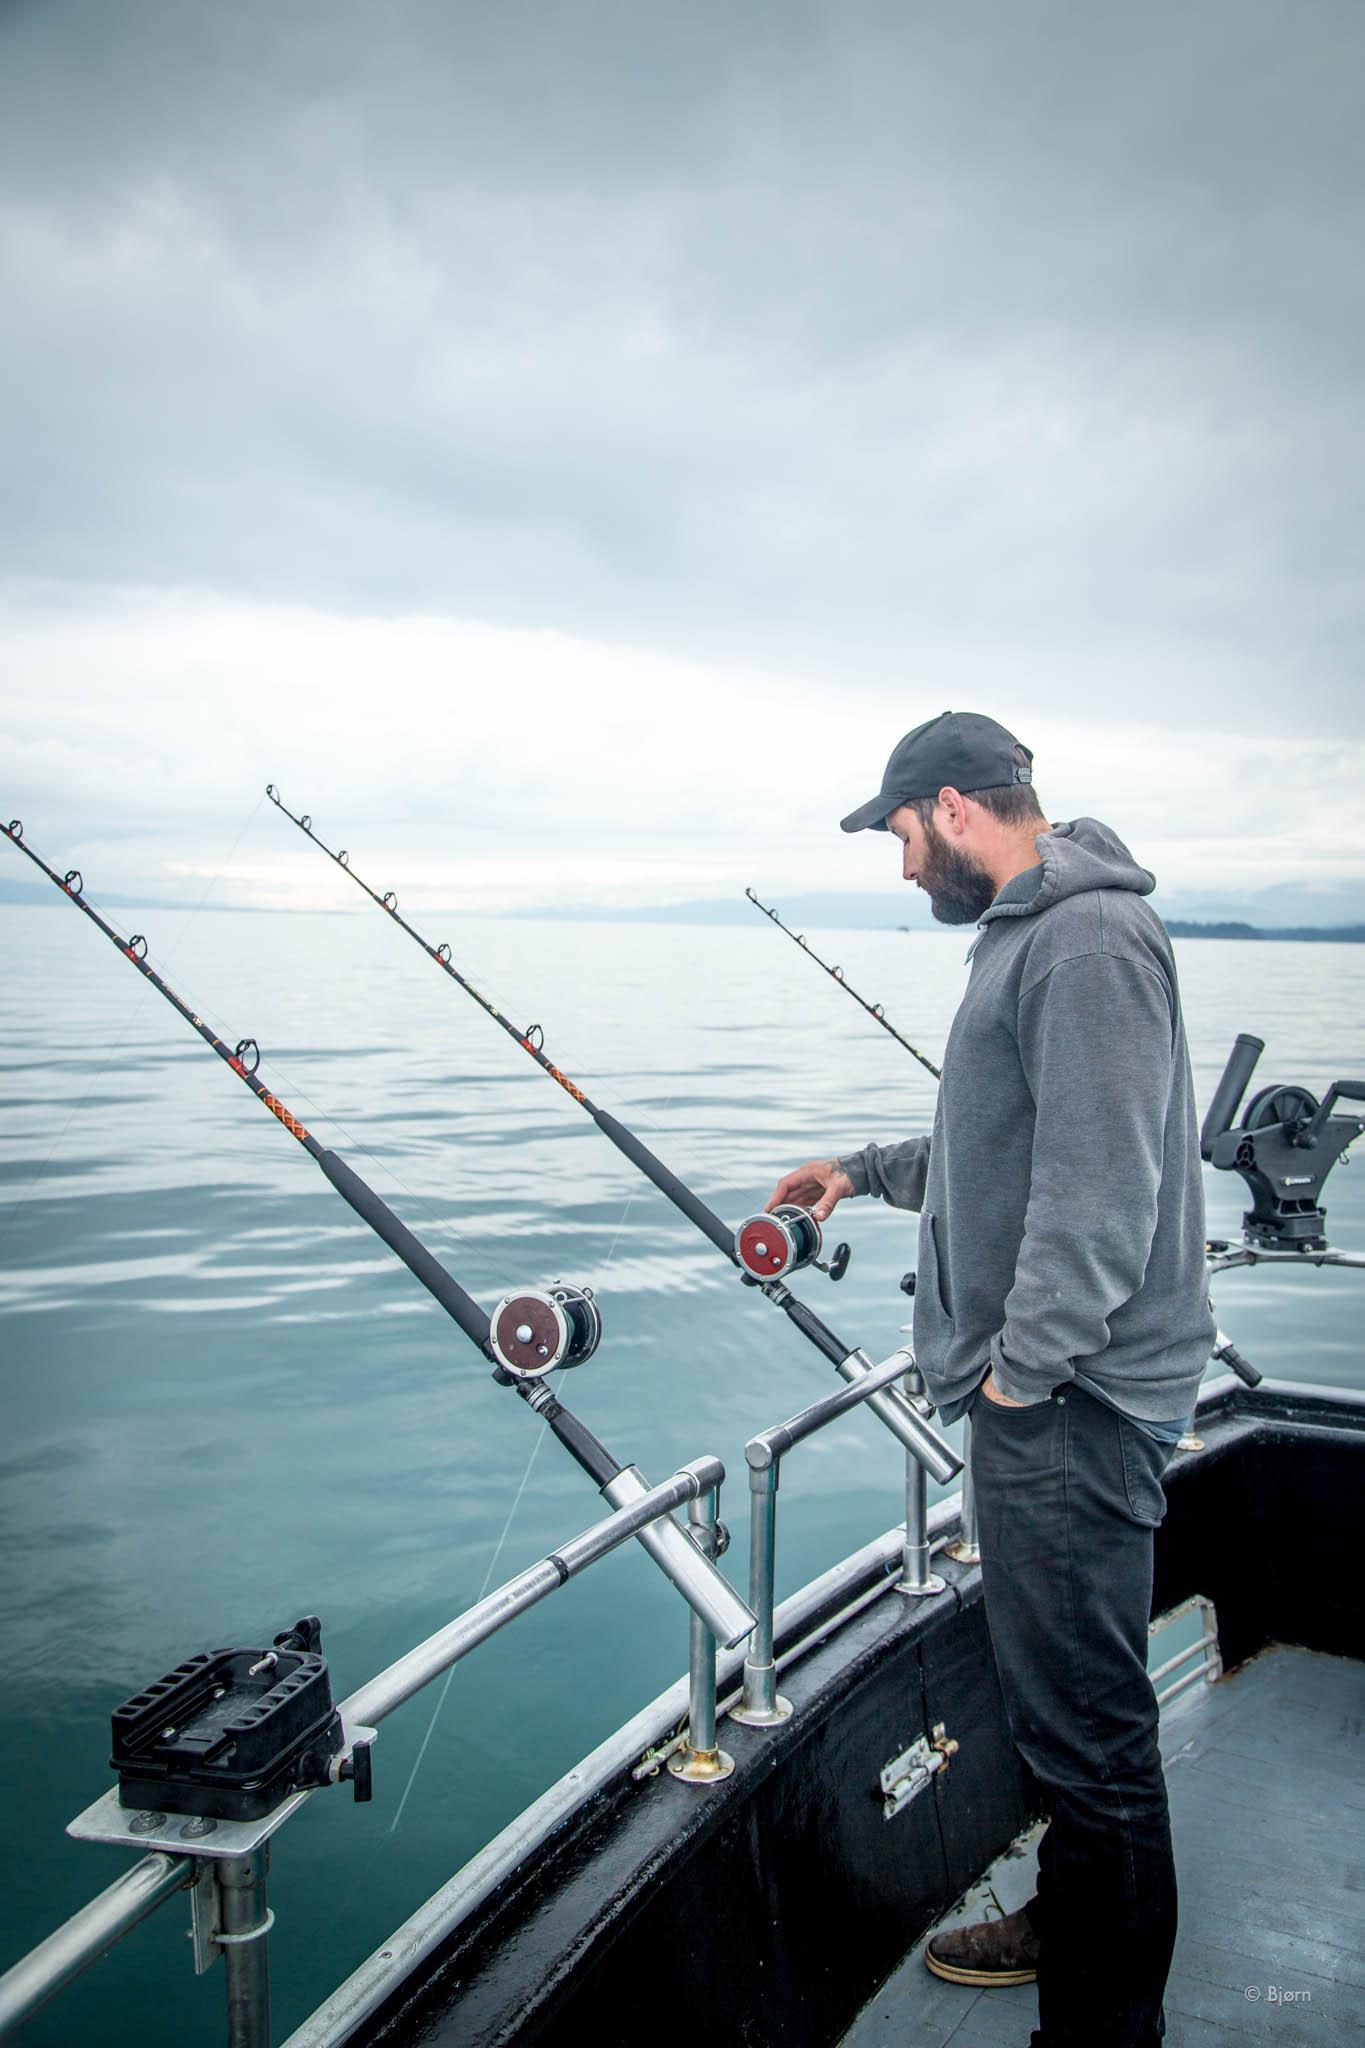 Billy fishing for halibut - Kachemak Bay, Alaska.